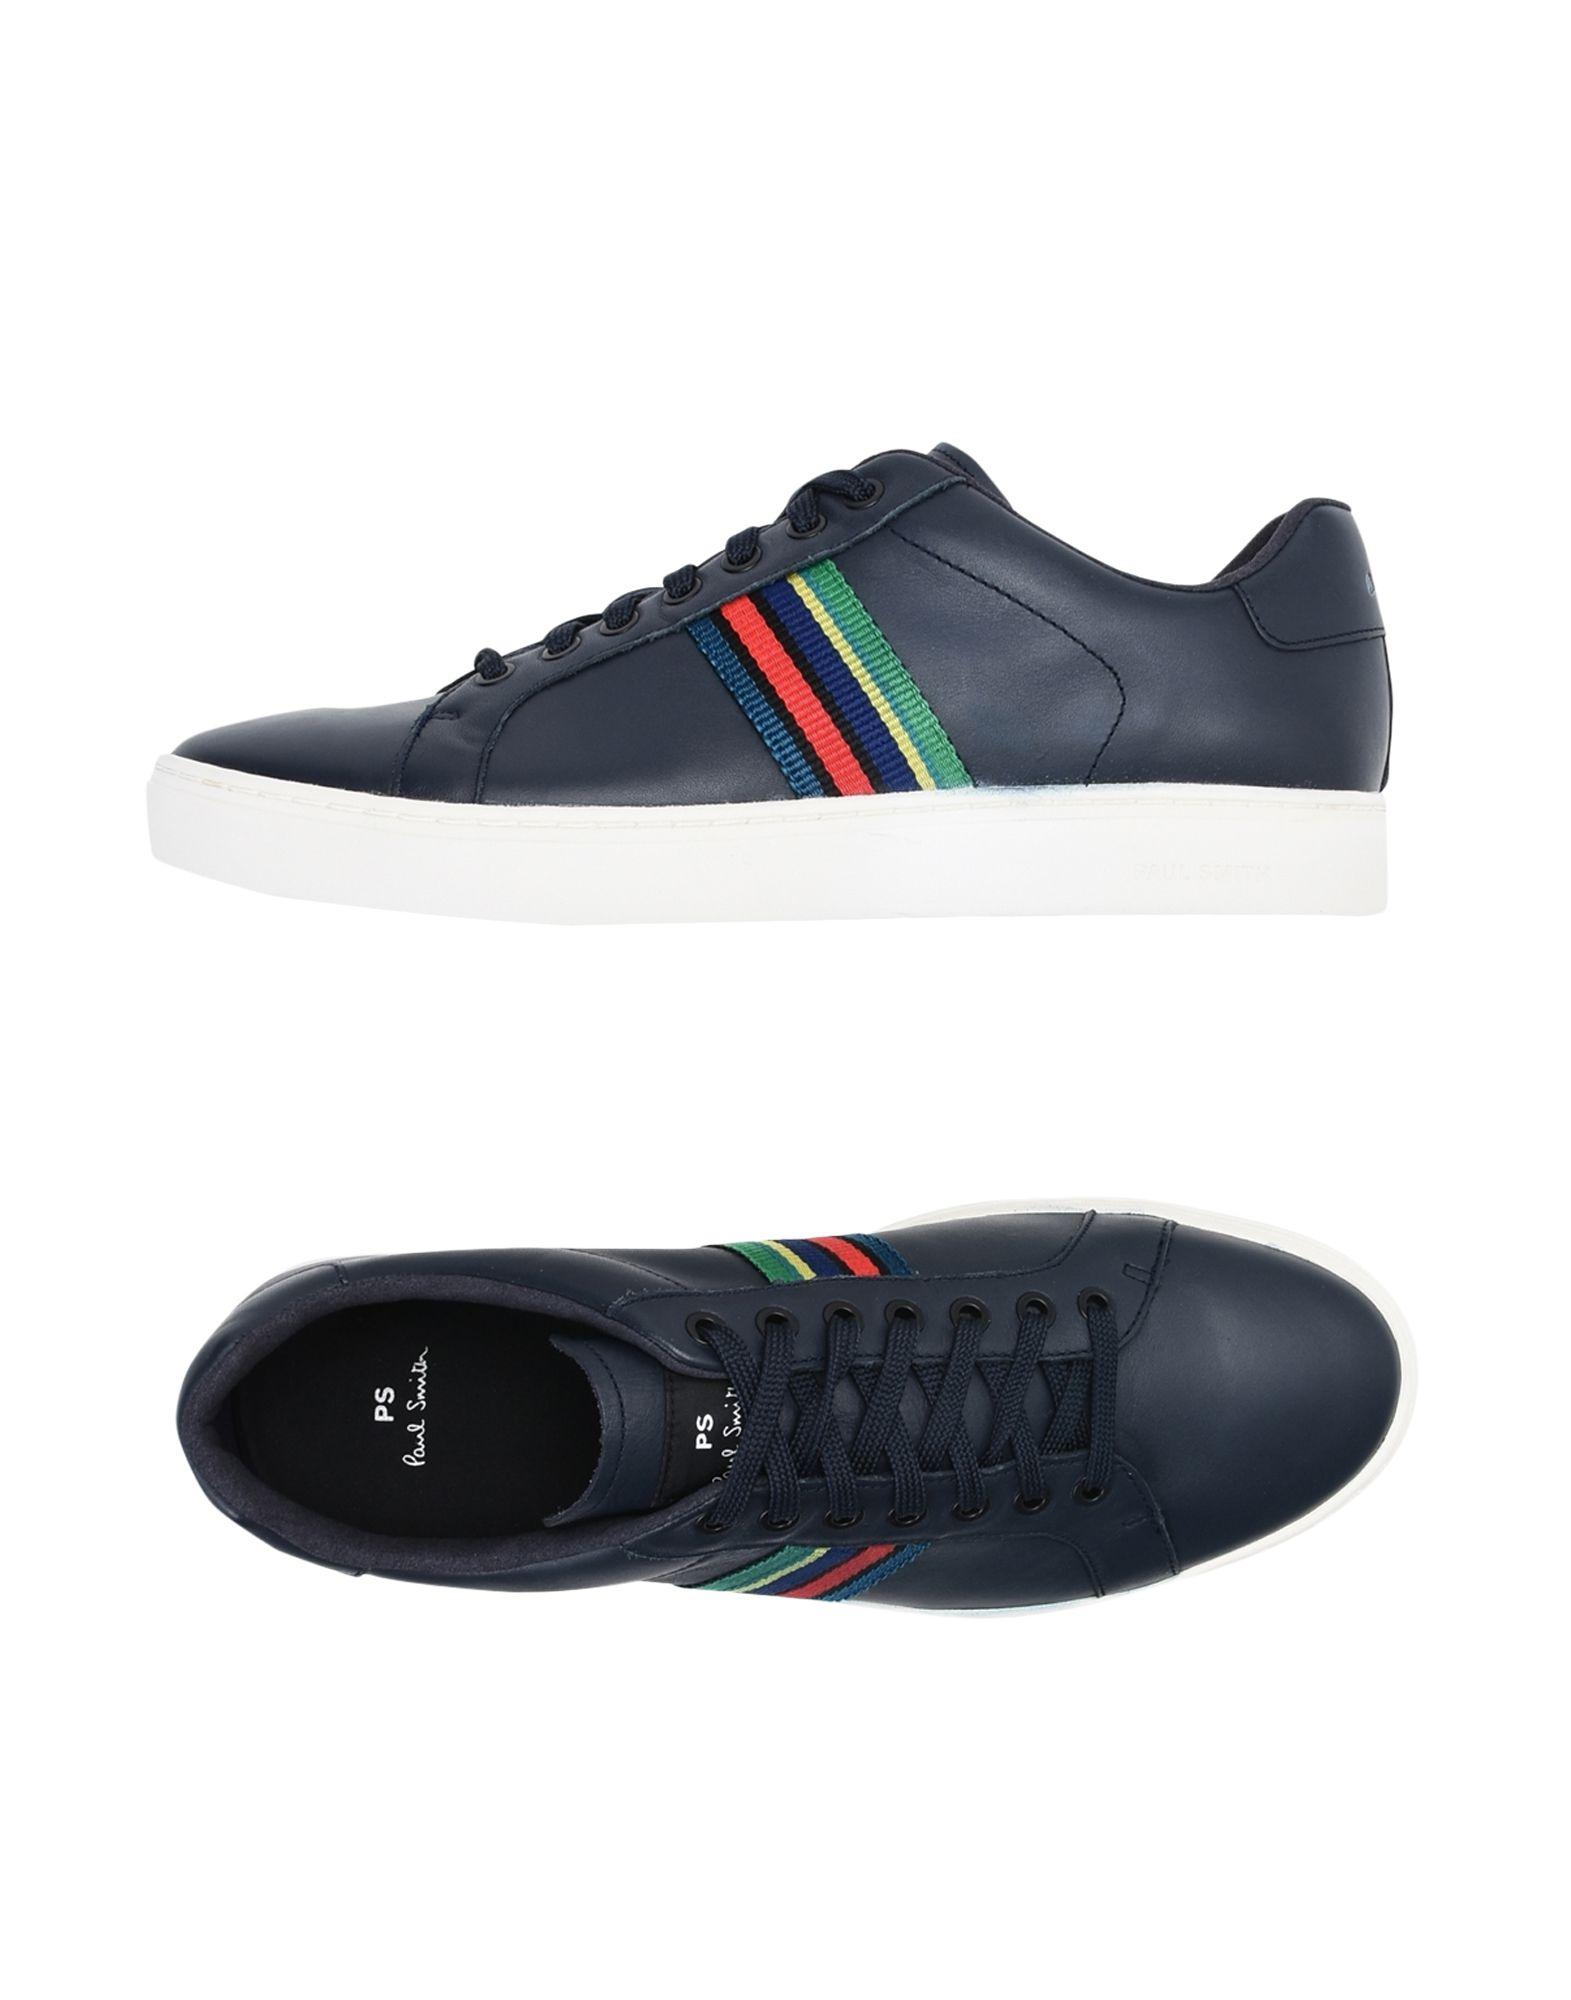 Sneakers Paul Smith Mens Shoe Lapin Dark Navy - Uomo - Acquista online su